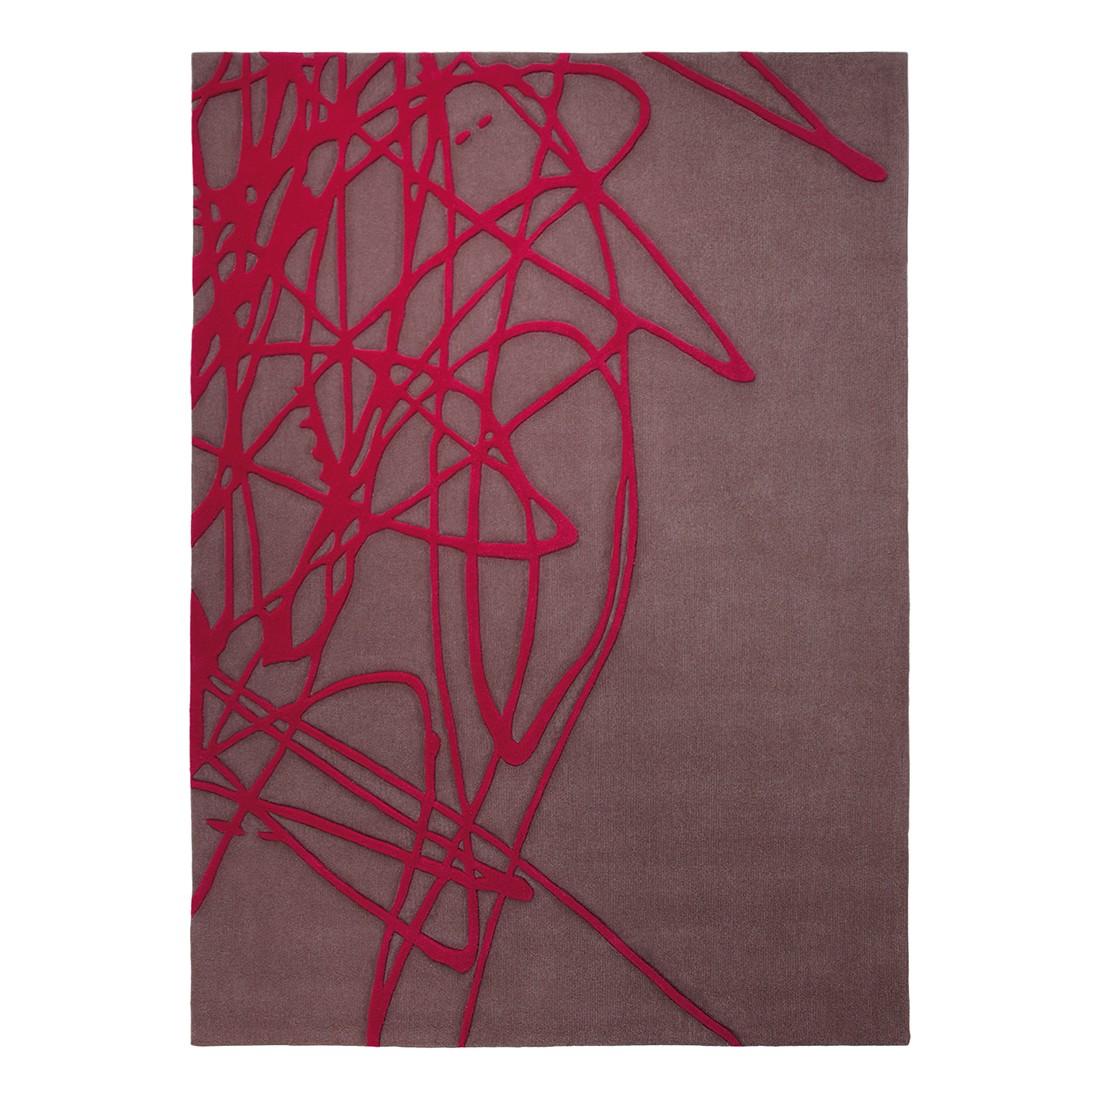 Teppich Brainstorm - Wolle/Taupe - Maße: 200 cm x 300 cm, Esprit Home